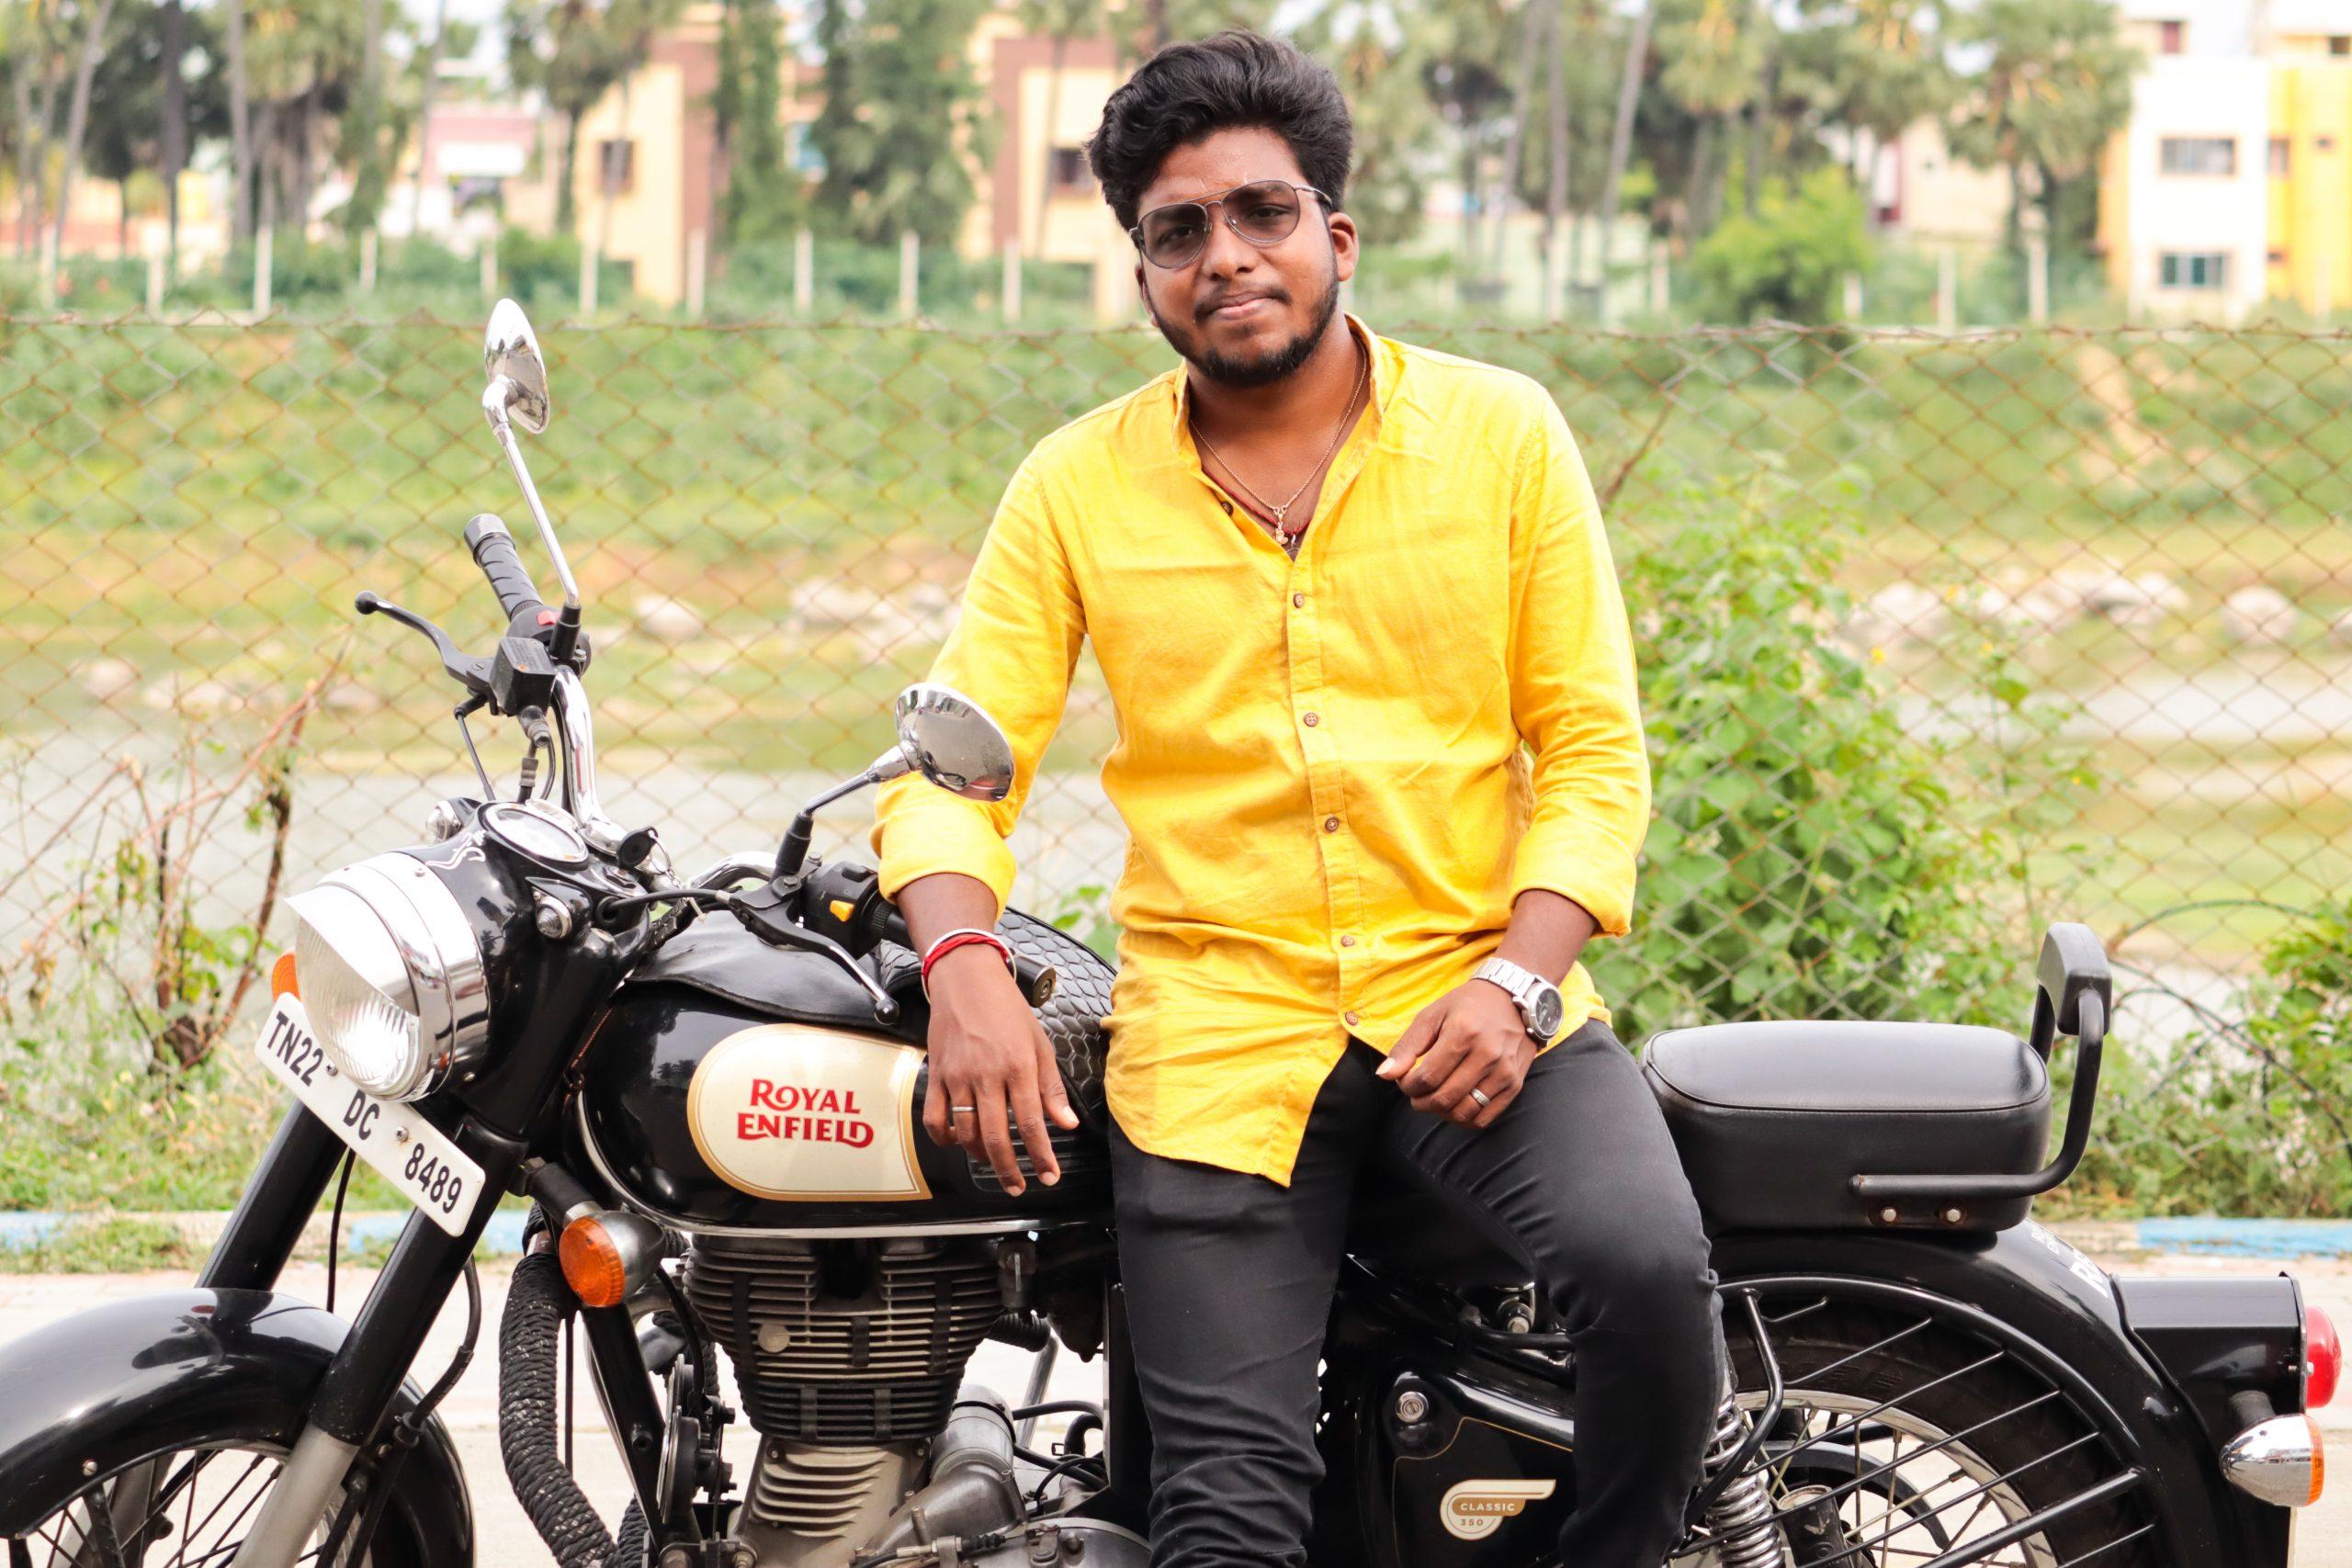 A boy on a bullet bike